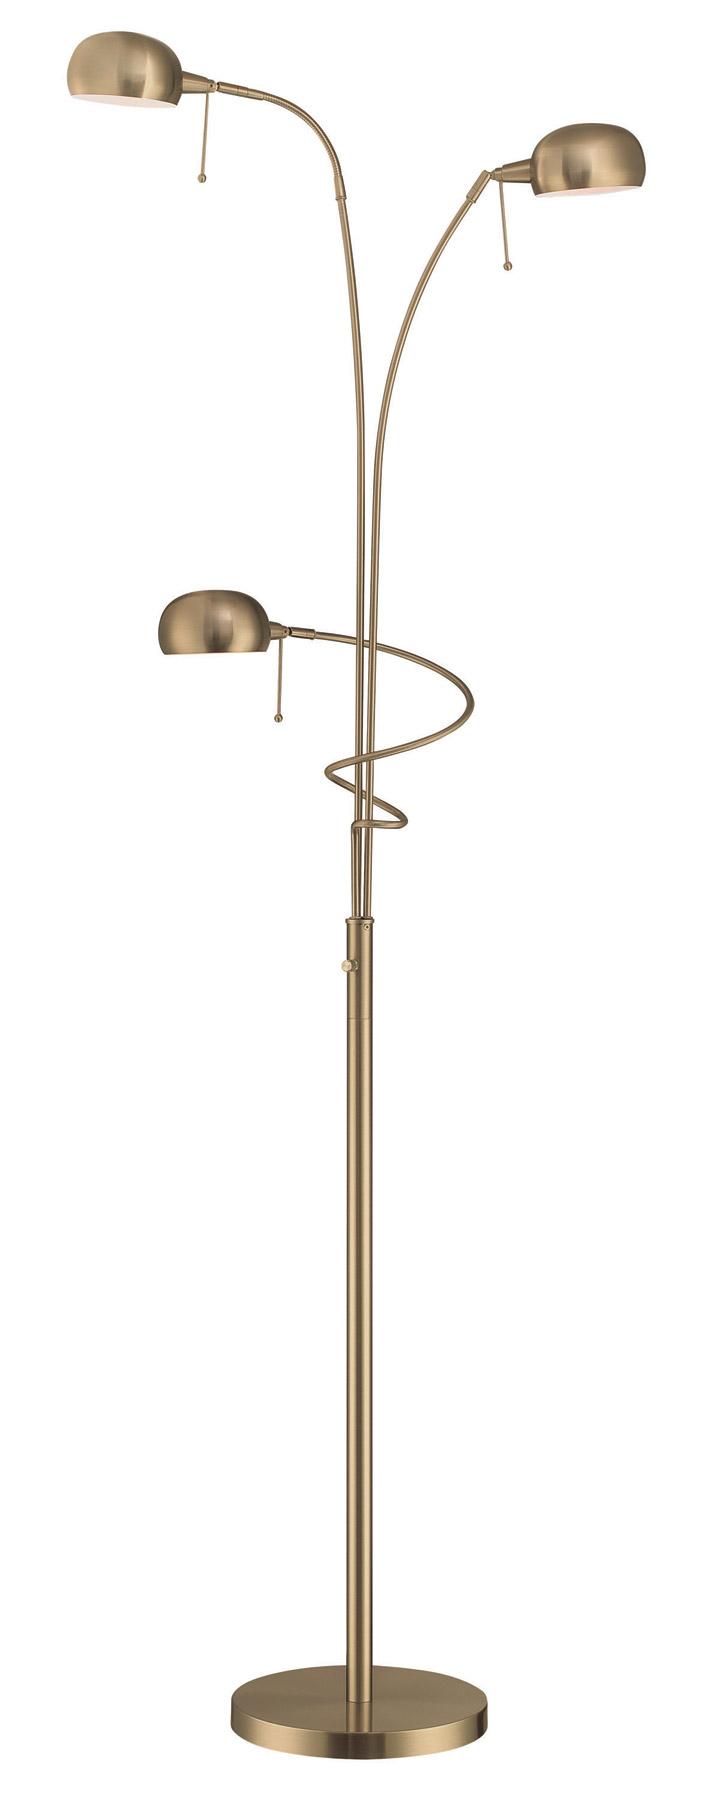 home lamps floor lamps bridge arm floor lamps lite source. Black Bedroom Furniture Sets. Home Design Ideas